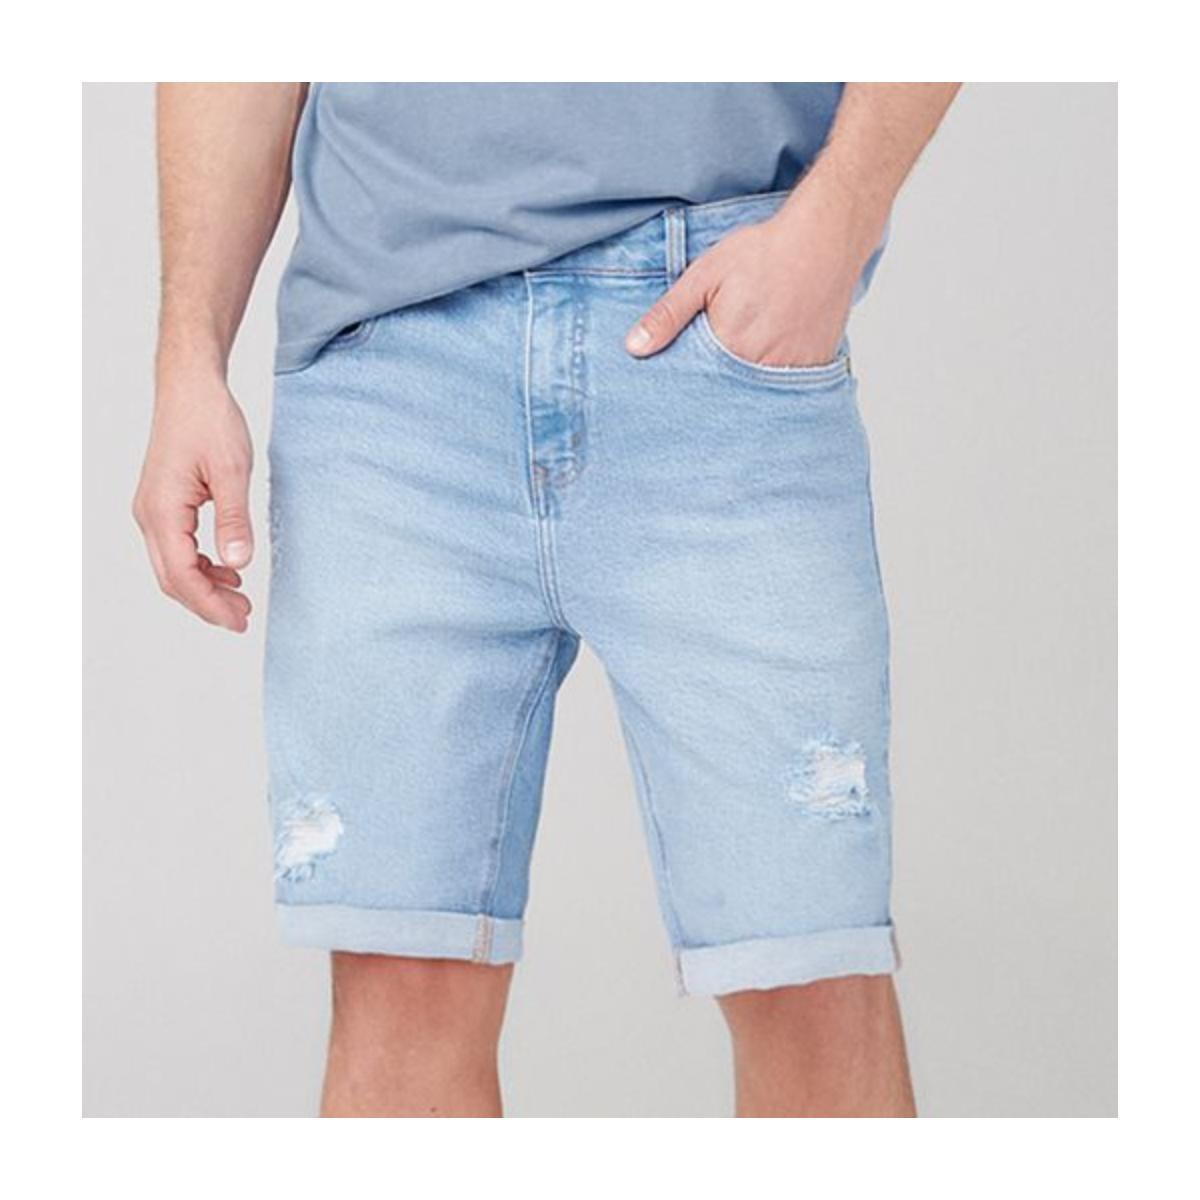 Bermuda Masculina Dzarm Zc4v 1bsn Jeans Claro